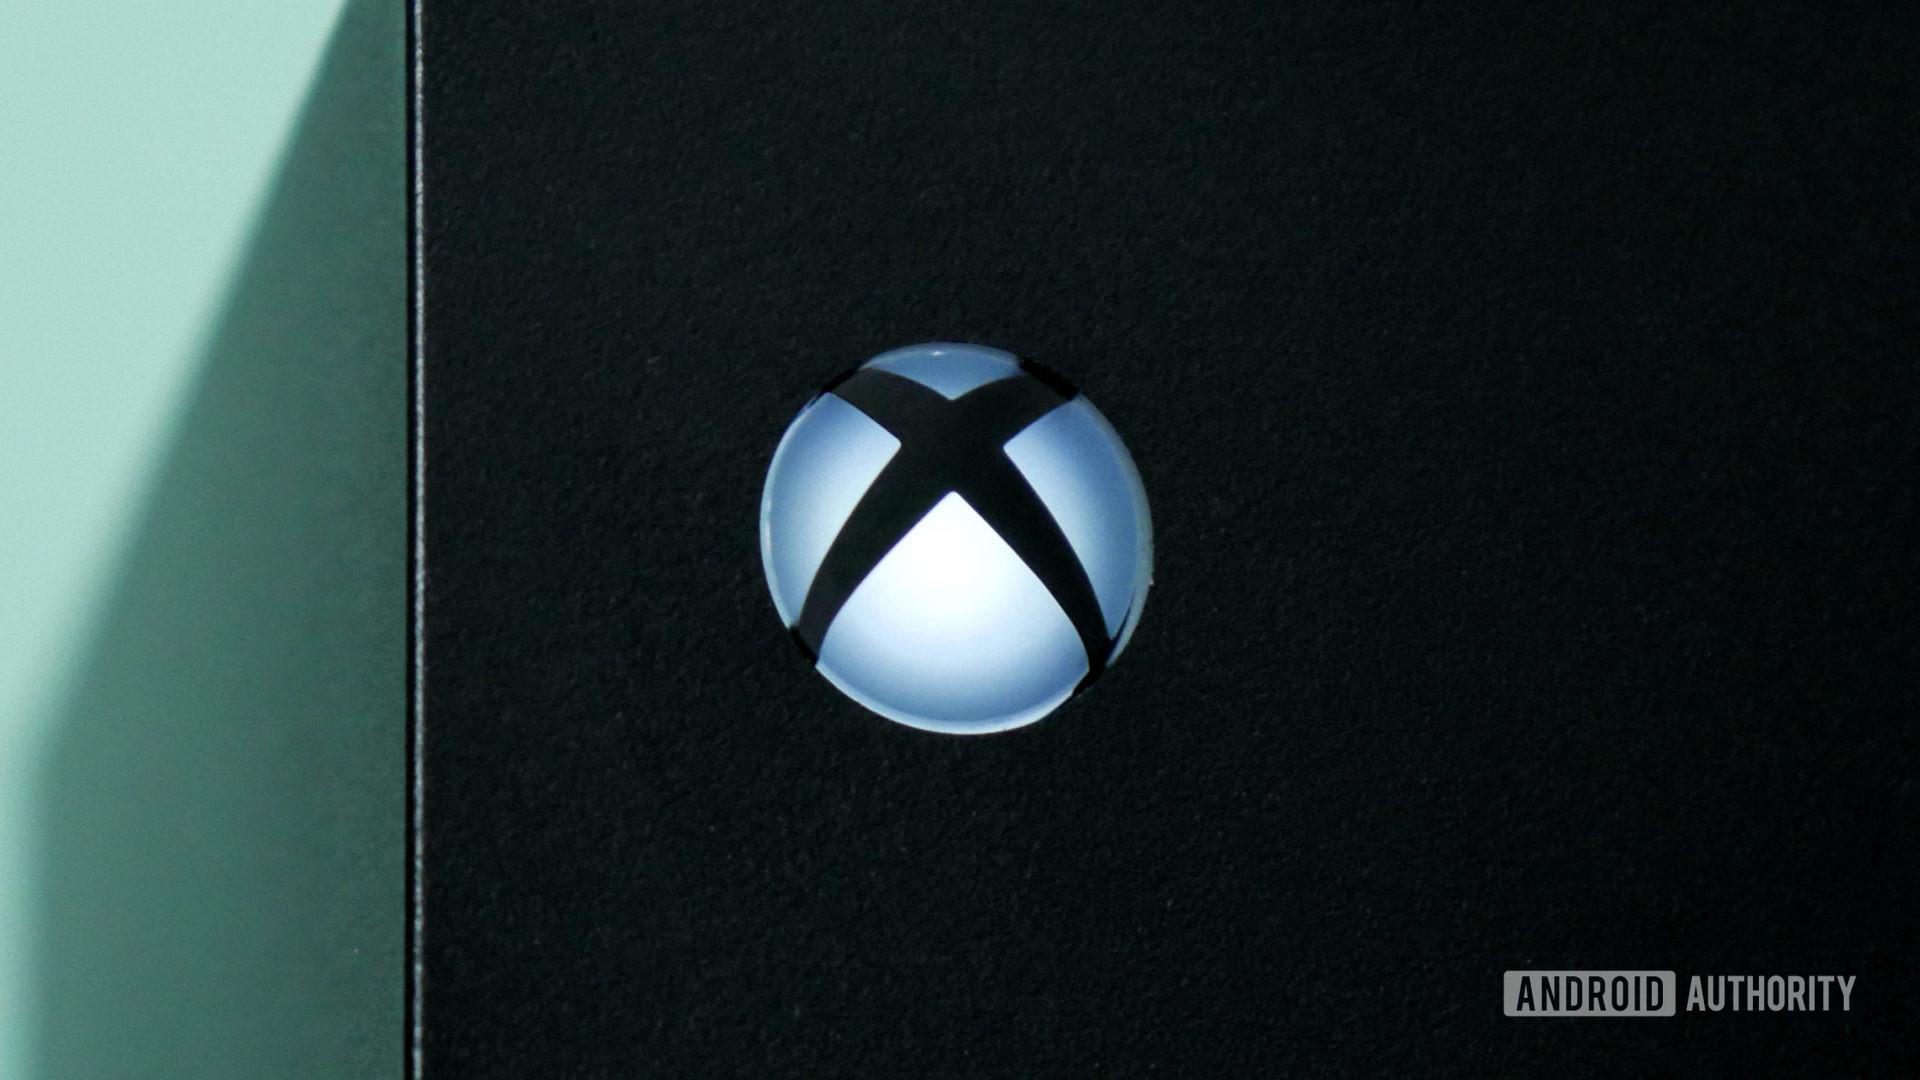 logotipo xbox série x